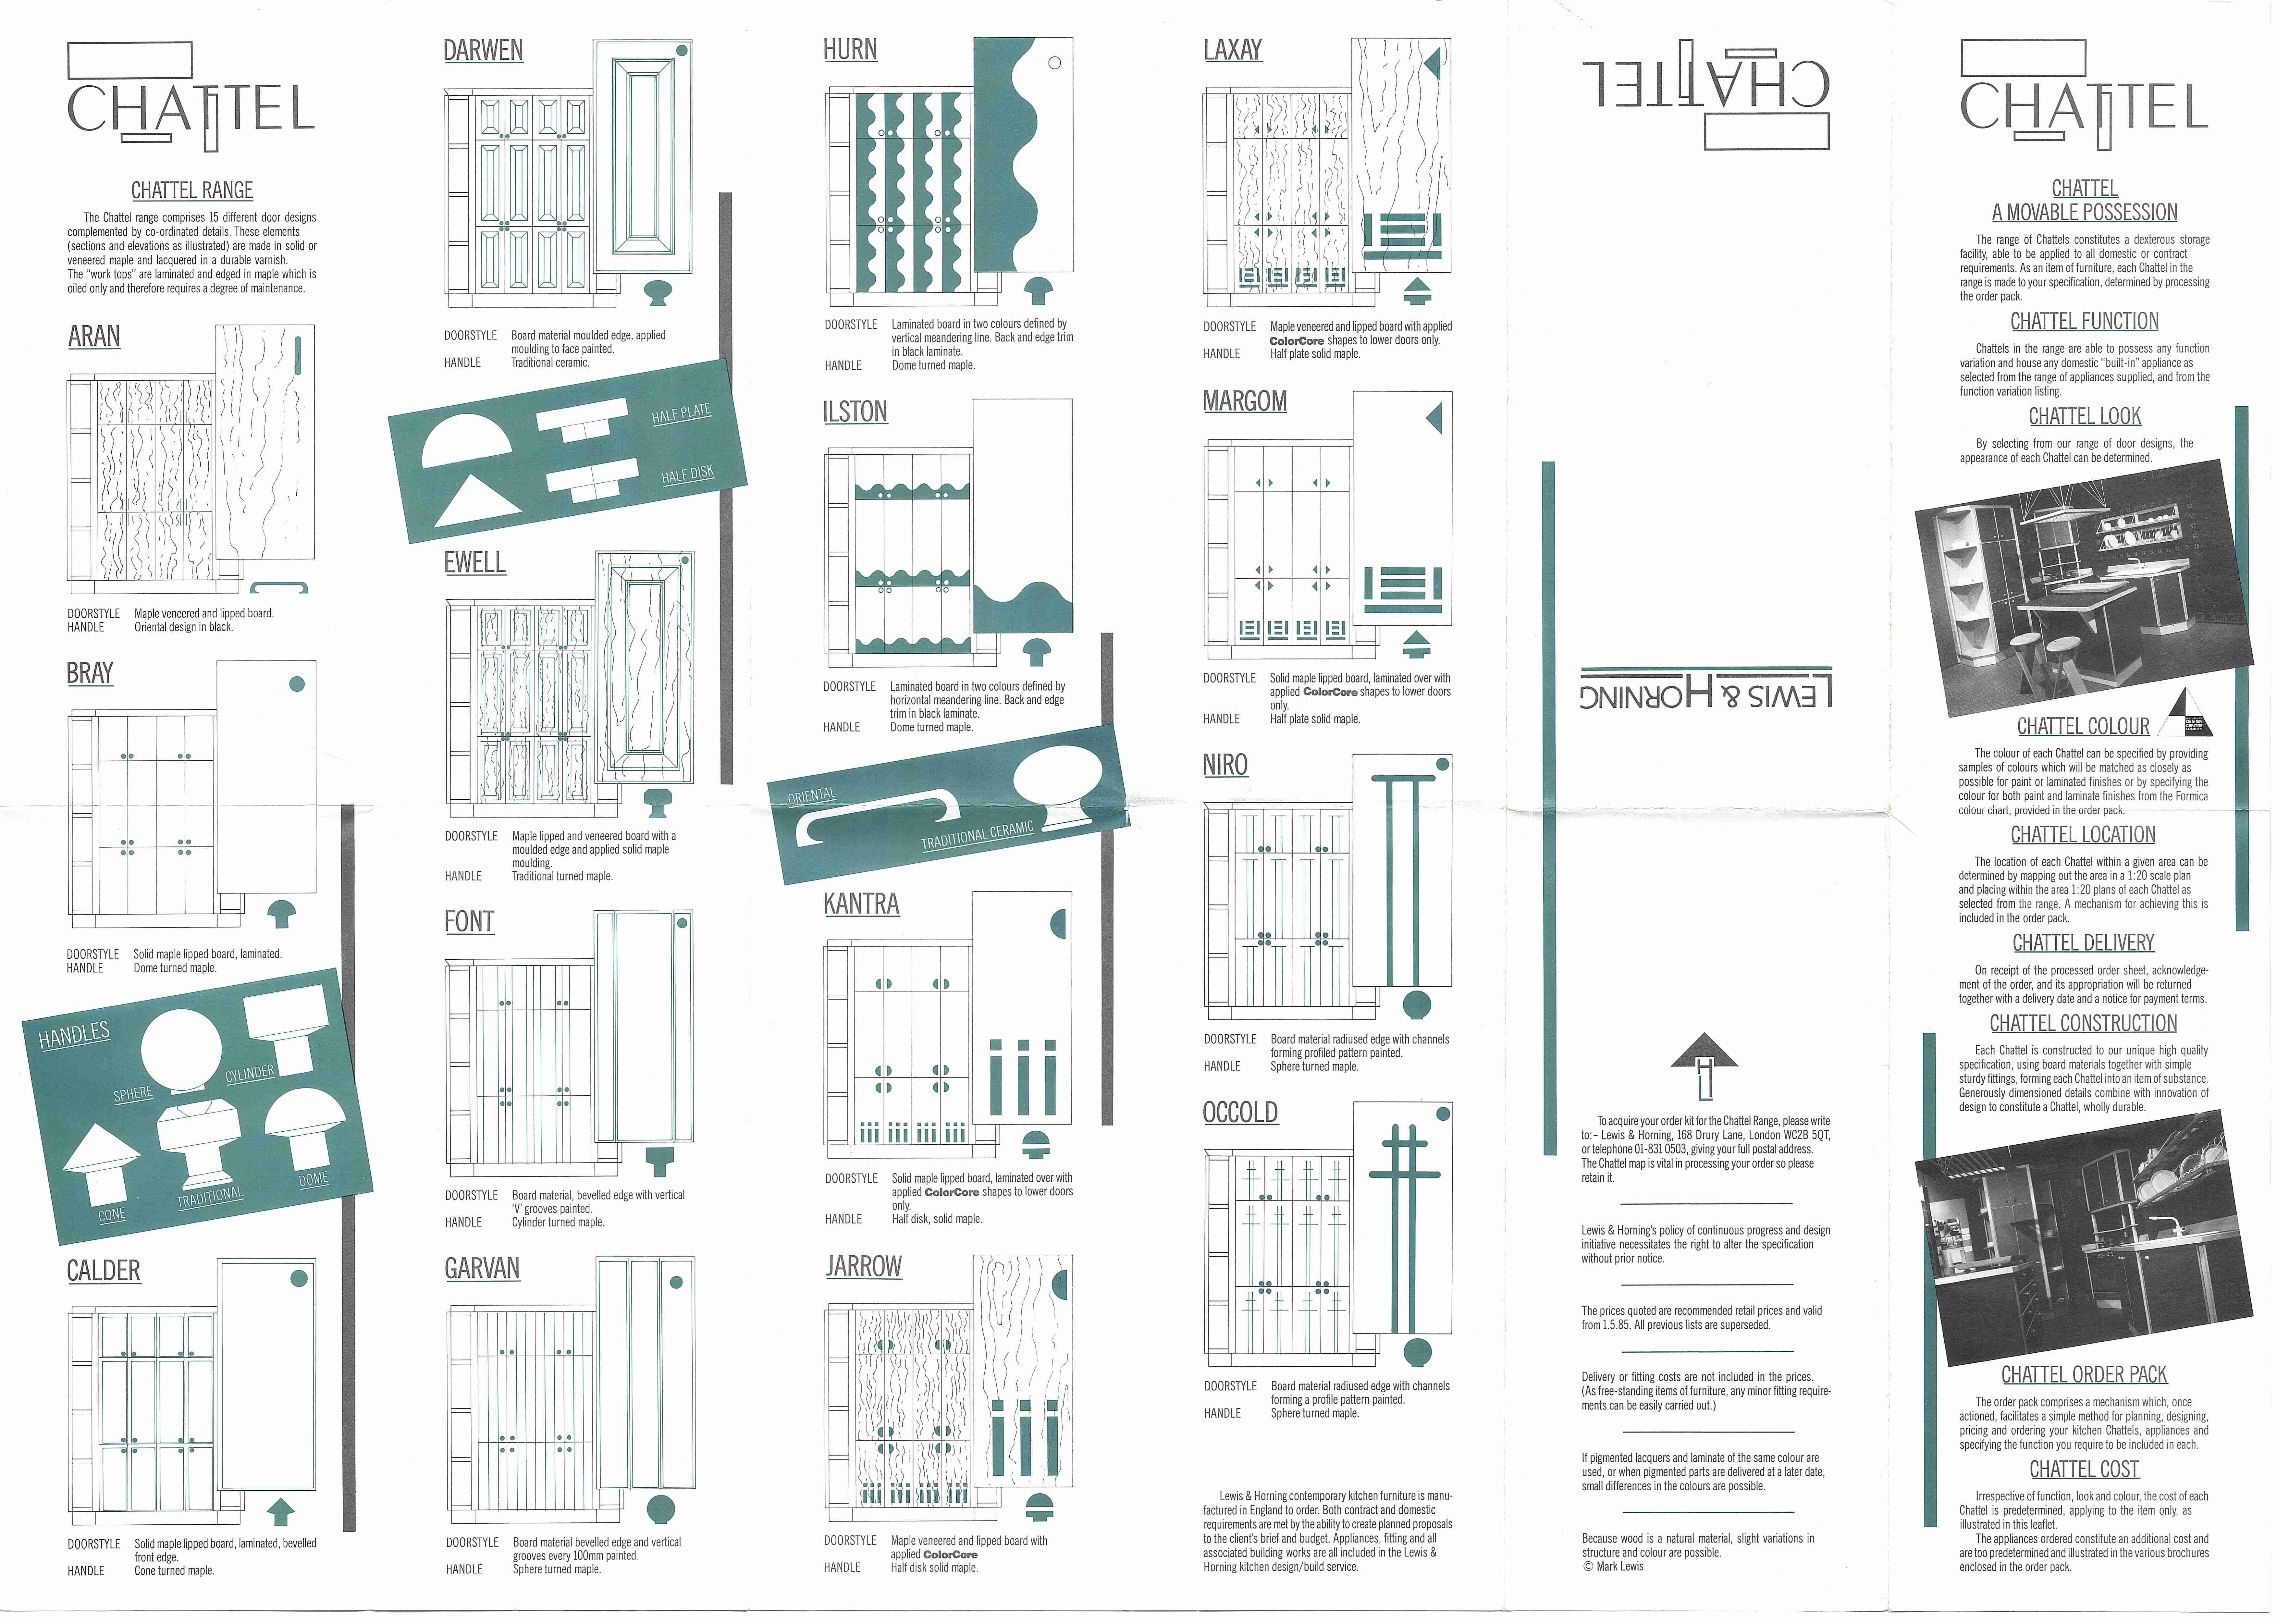 2 Lewis Design London - Chattel Instructions (1)